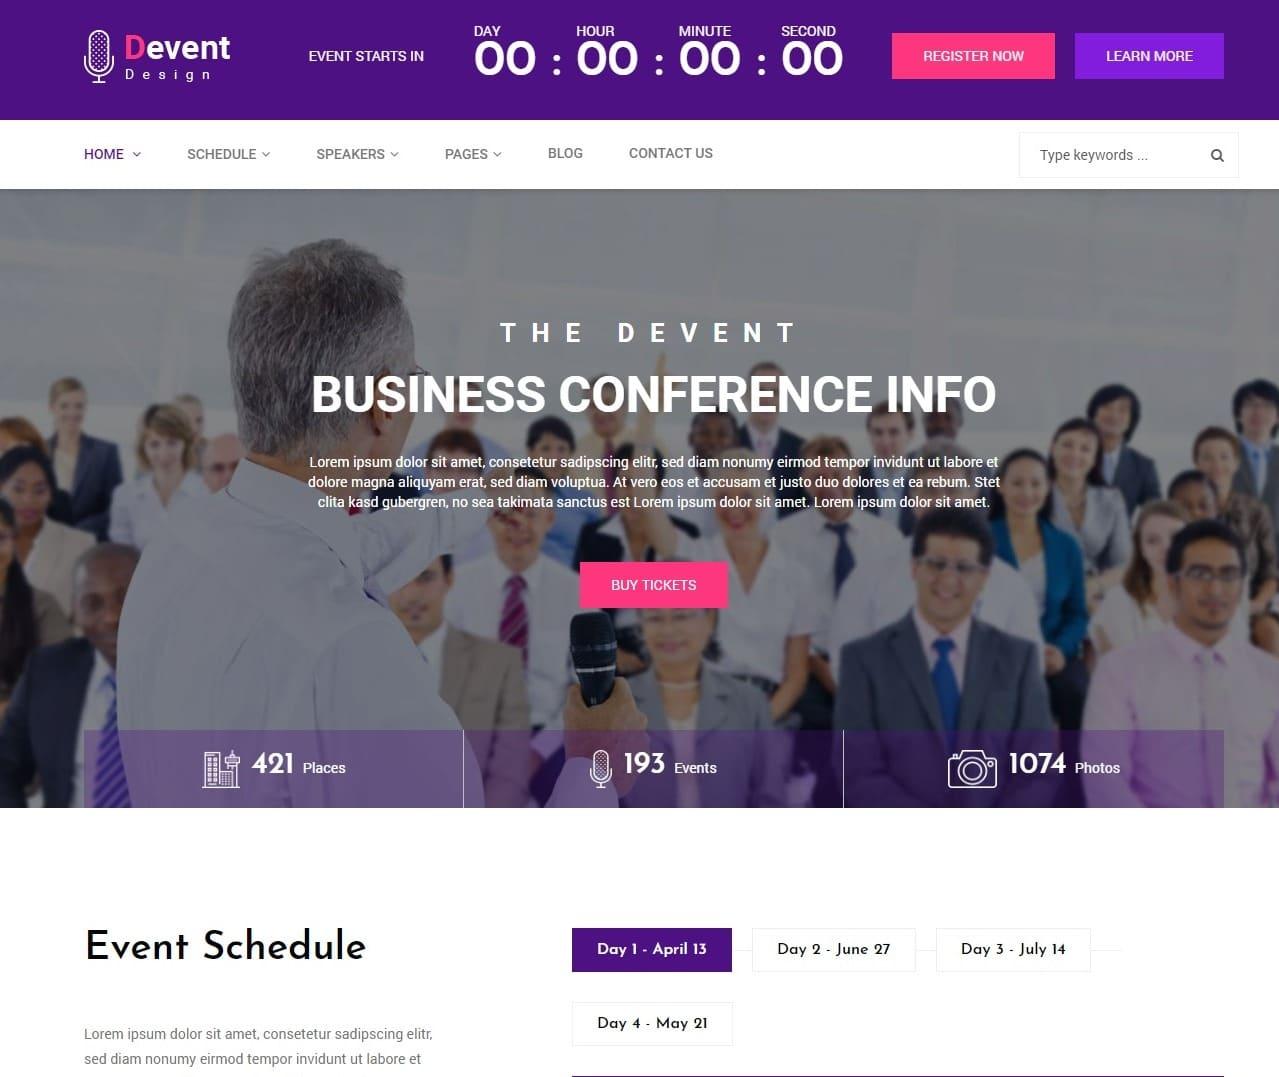 dvent-event-templates